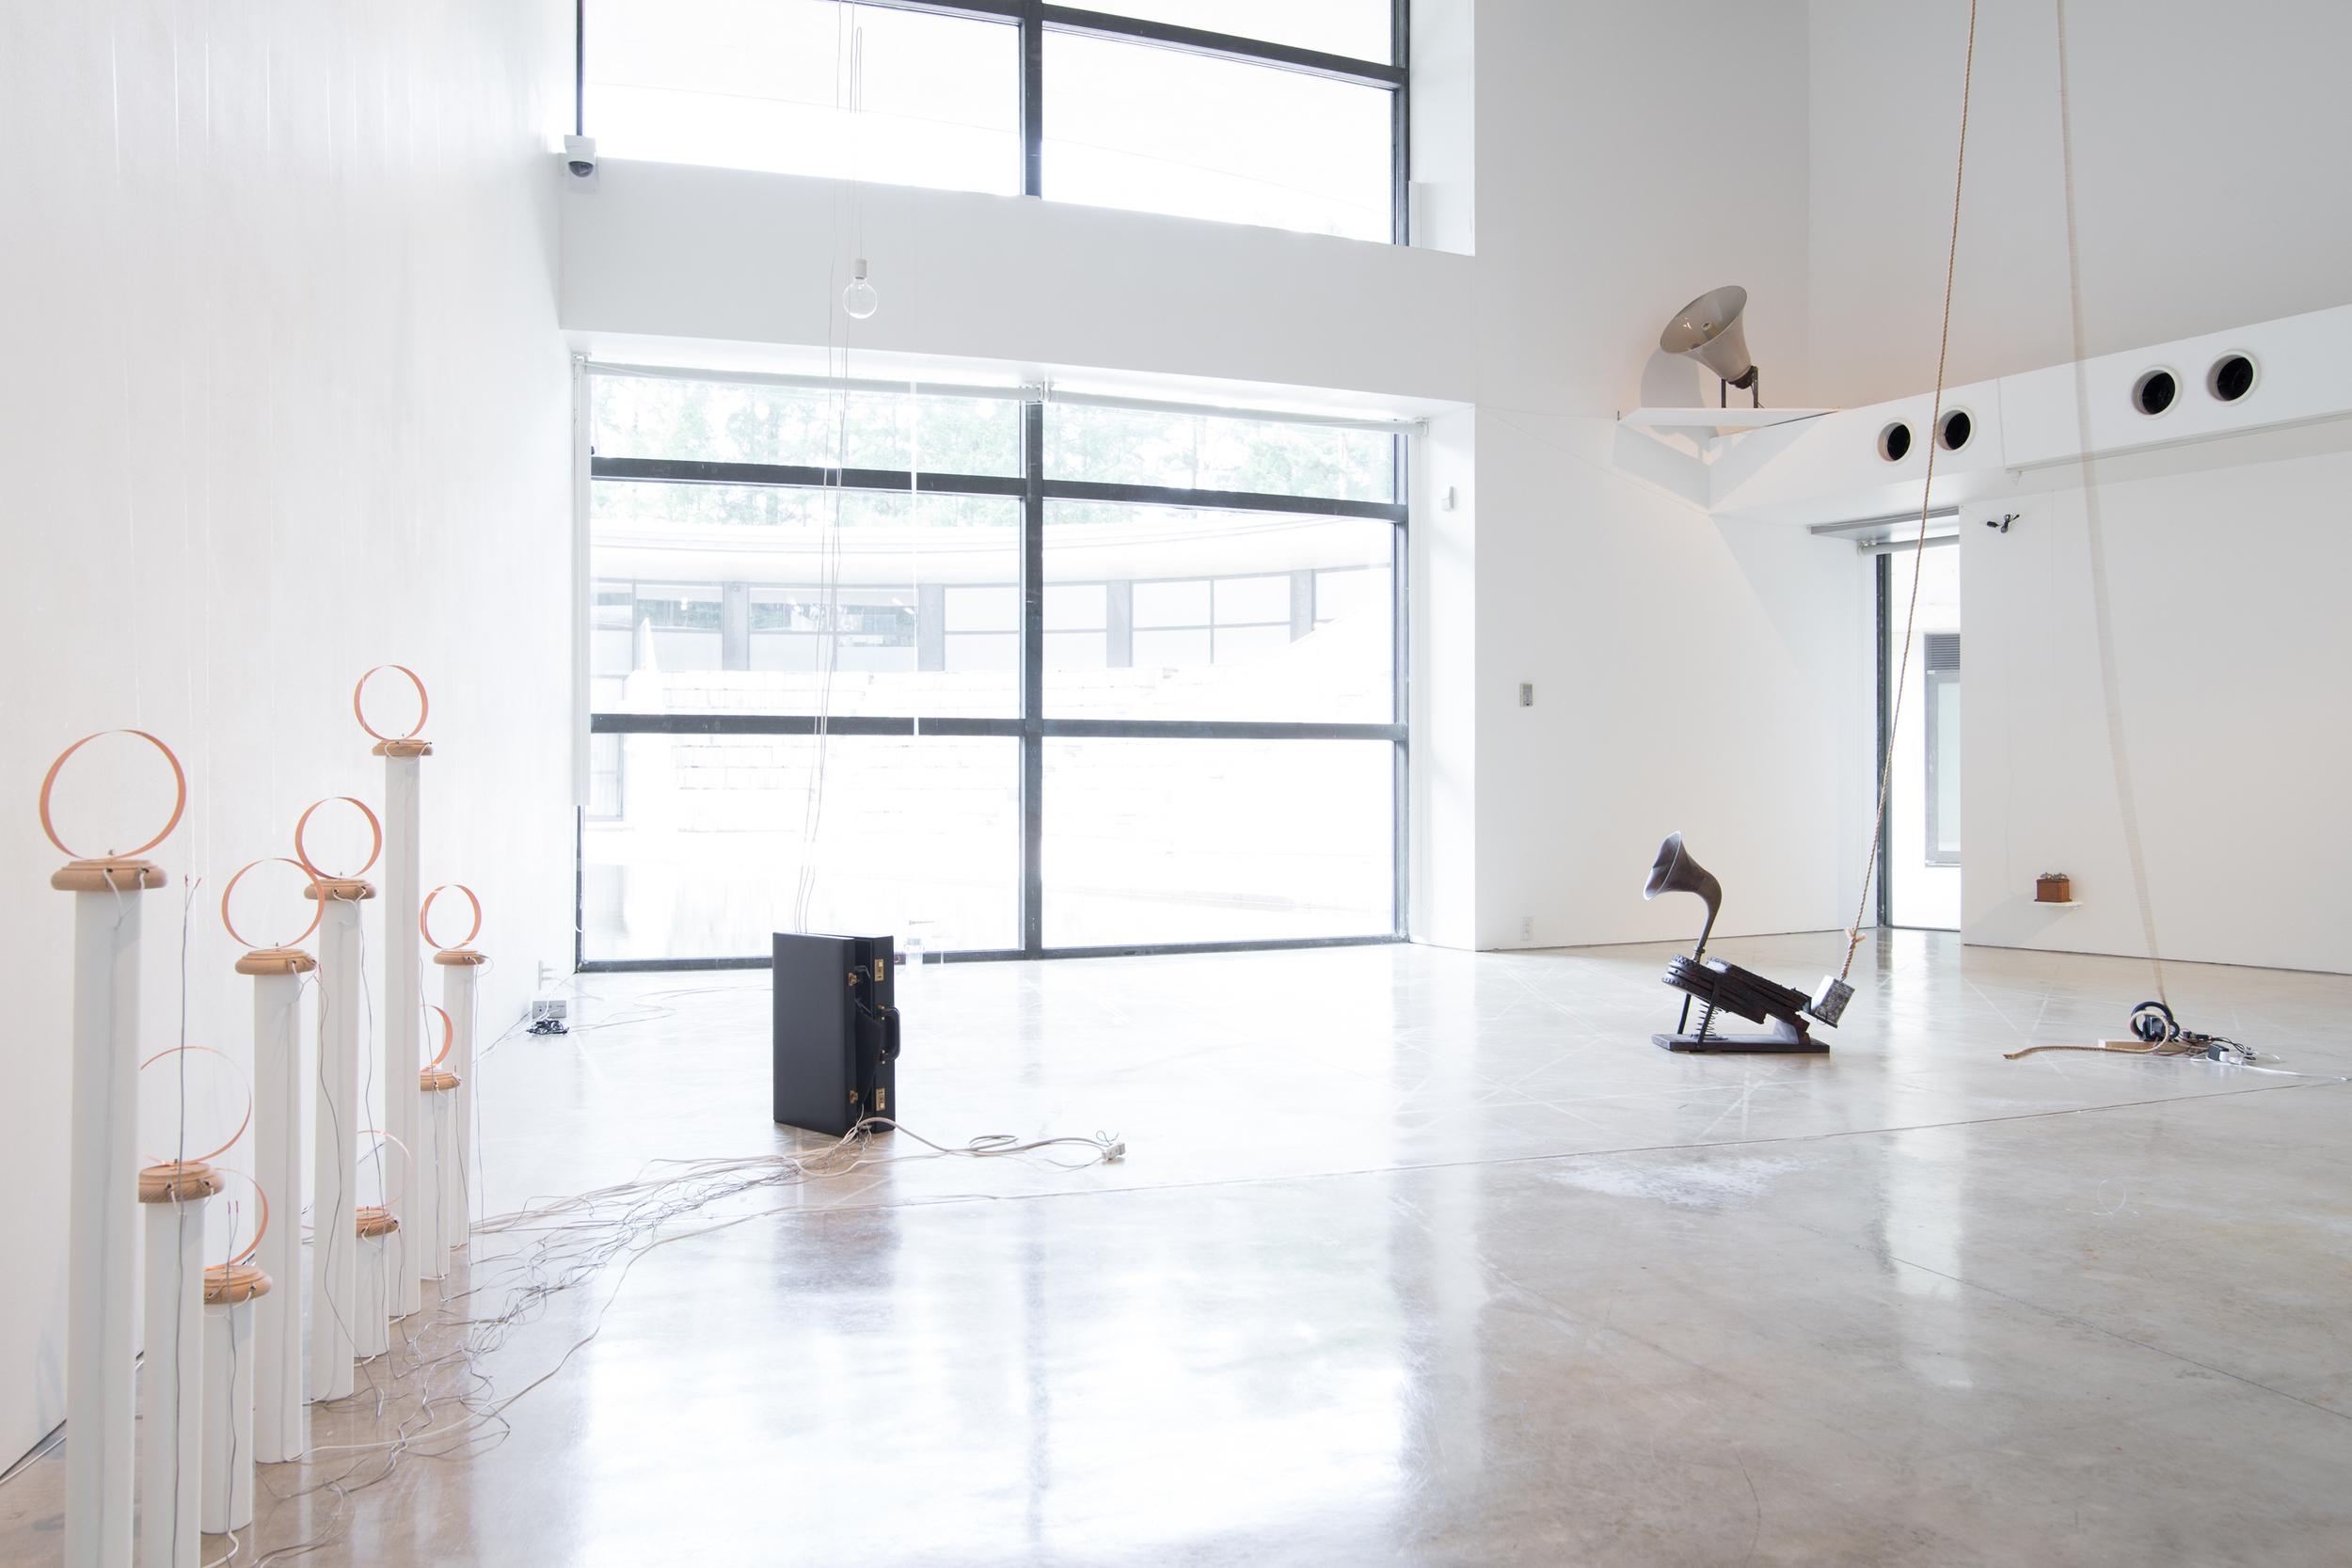 Yuko Mohri   Calls,  2013-14 Installation View at Aomori Contemporary Art Center (ACAC), Aomori, Japan,2014 Photo Credit: Kuniya Oyamada bells, fork, glass, horn, electric magnet, ribbon, cloth, coil, suitcase, etc. dimensions variable